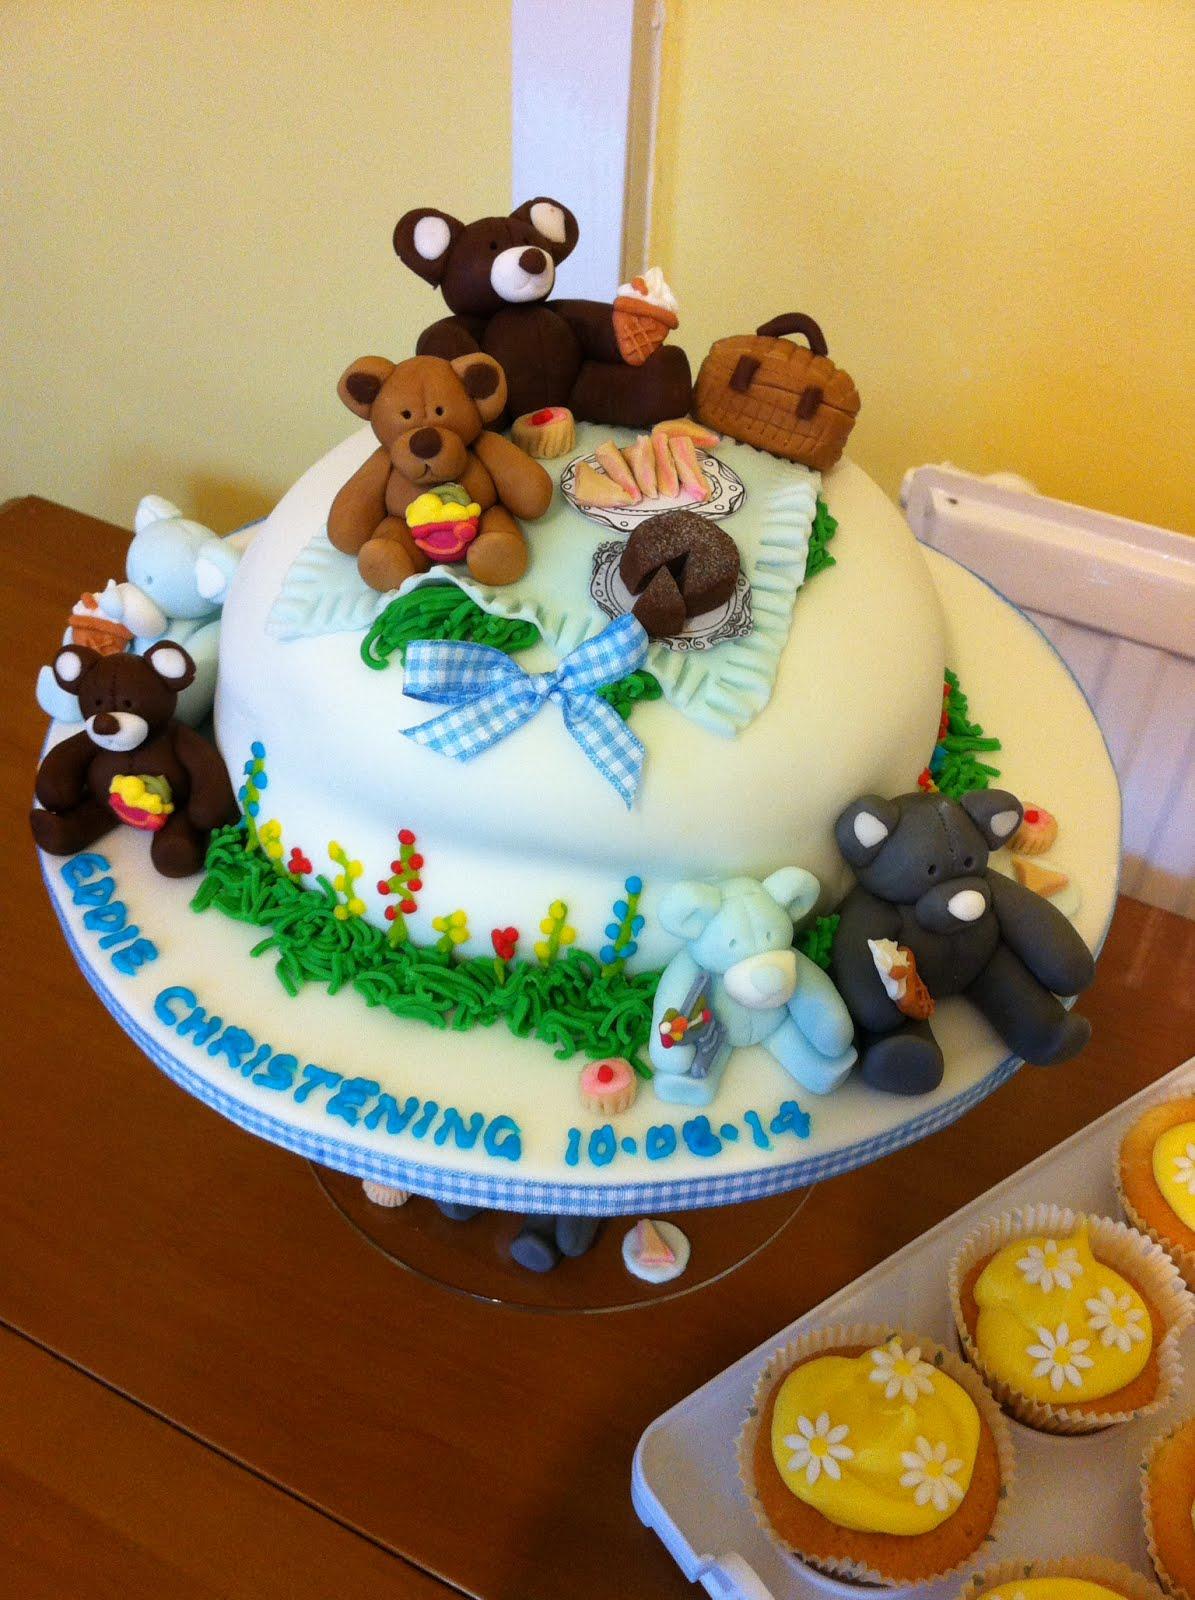 ♥•*¨*•♥Teddy Bears Picnic Cake